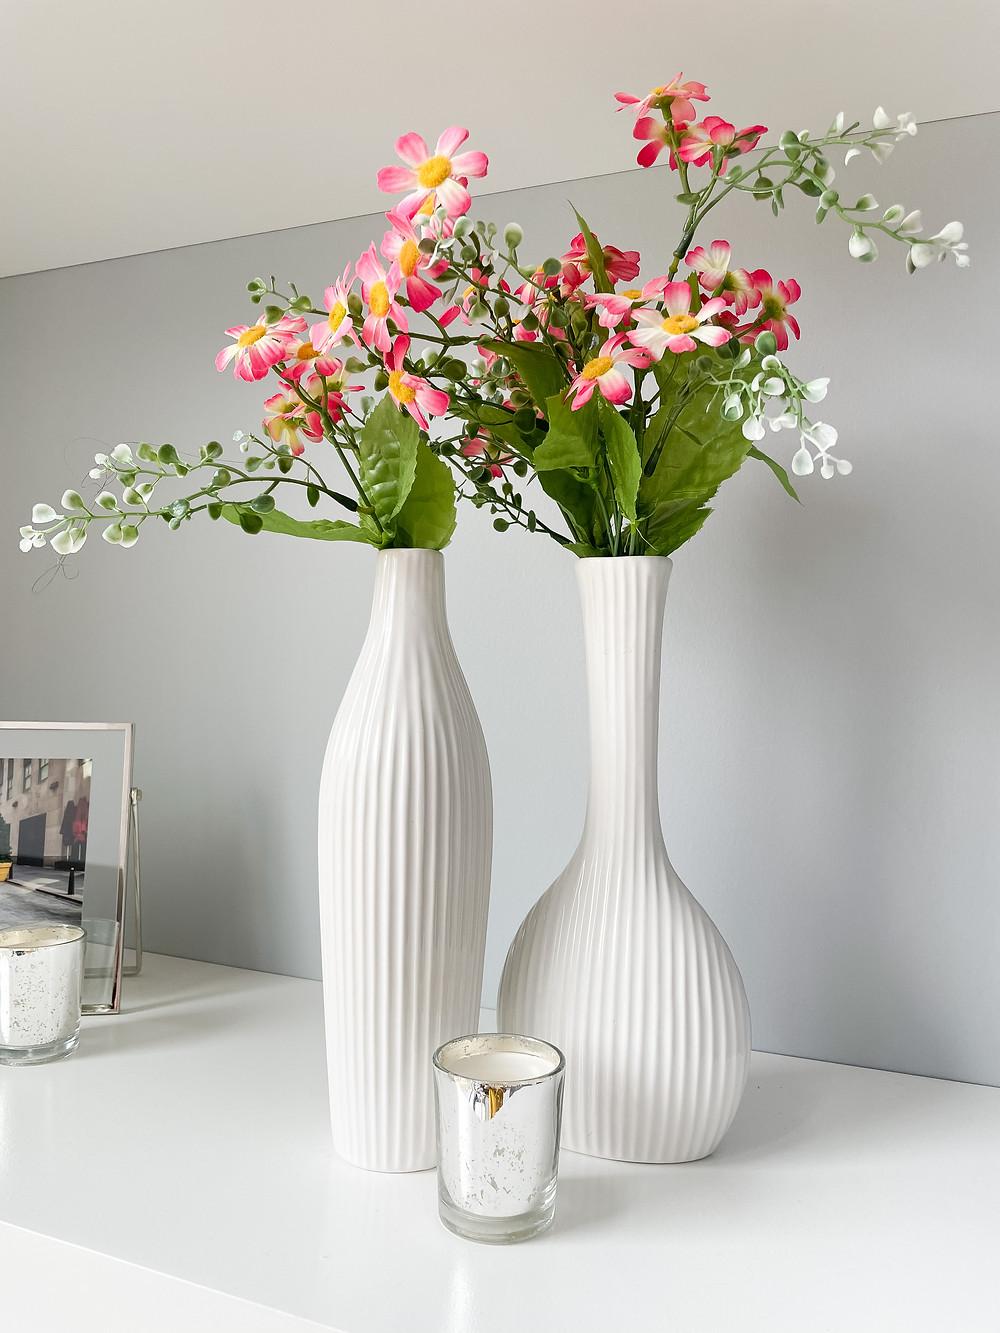 Modern Floral Touches For Spring. #hometour #springdecor #springdecoratingideas